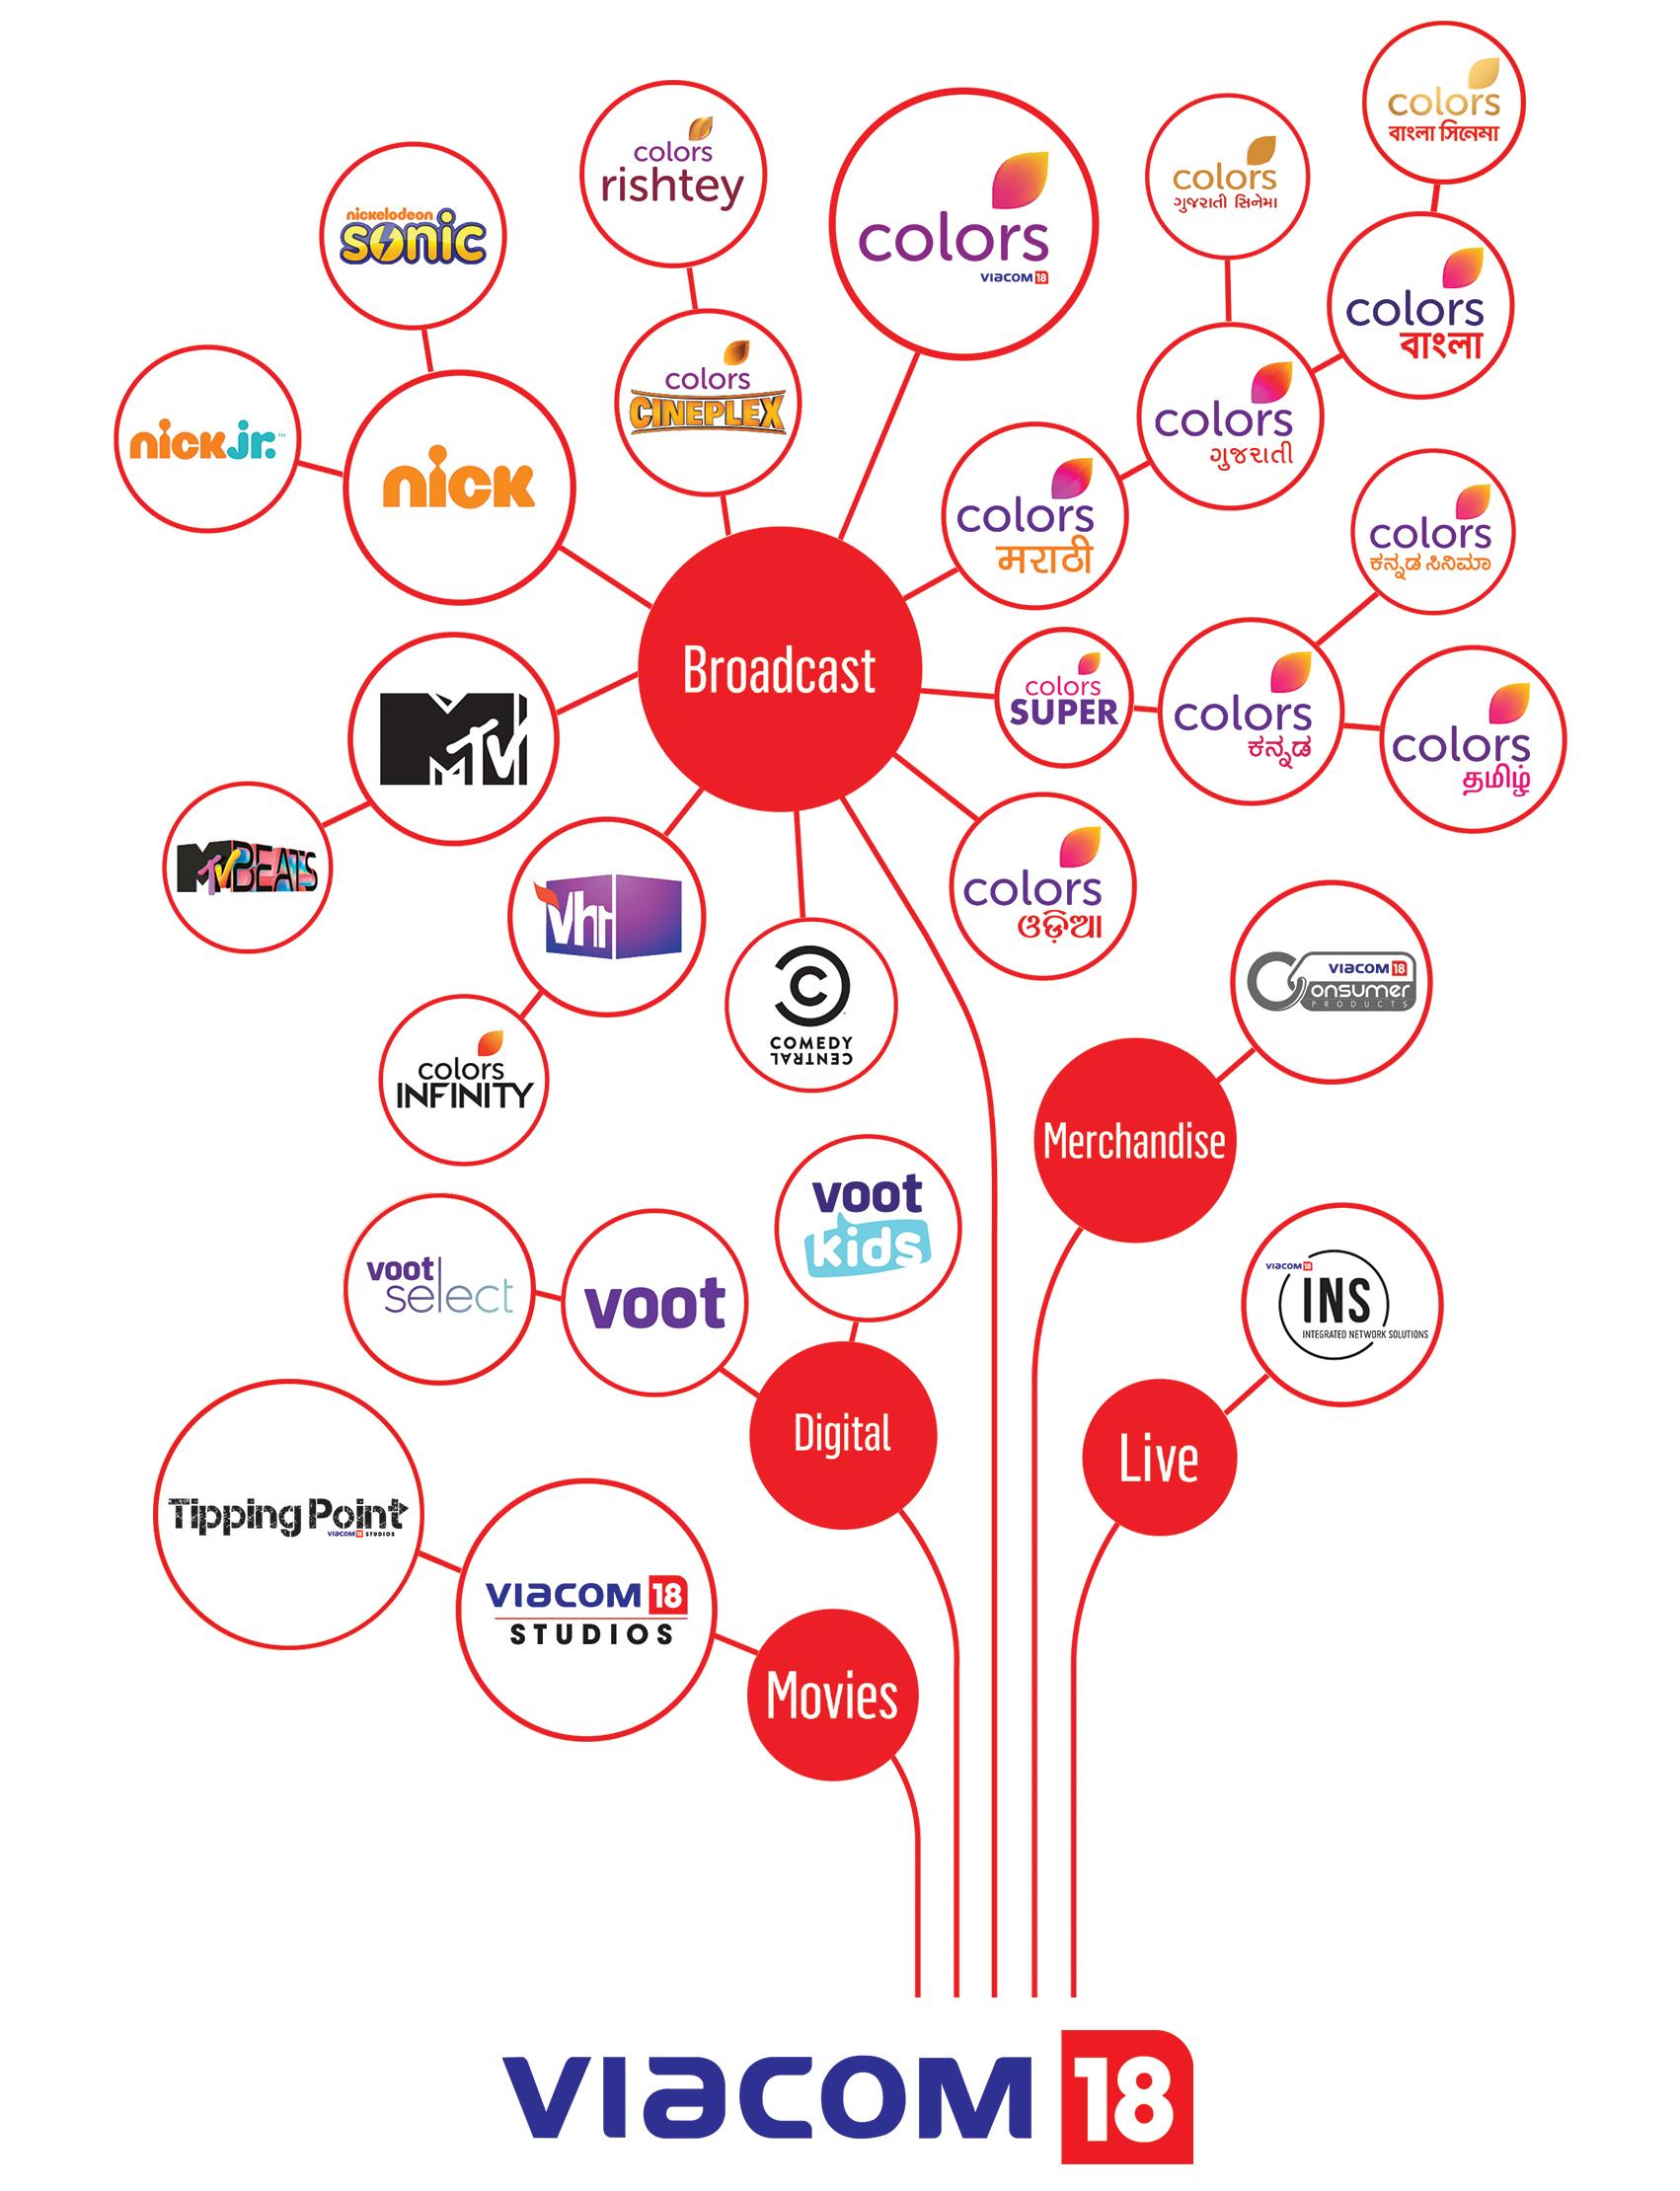 Viacom18 Channels